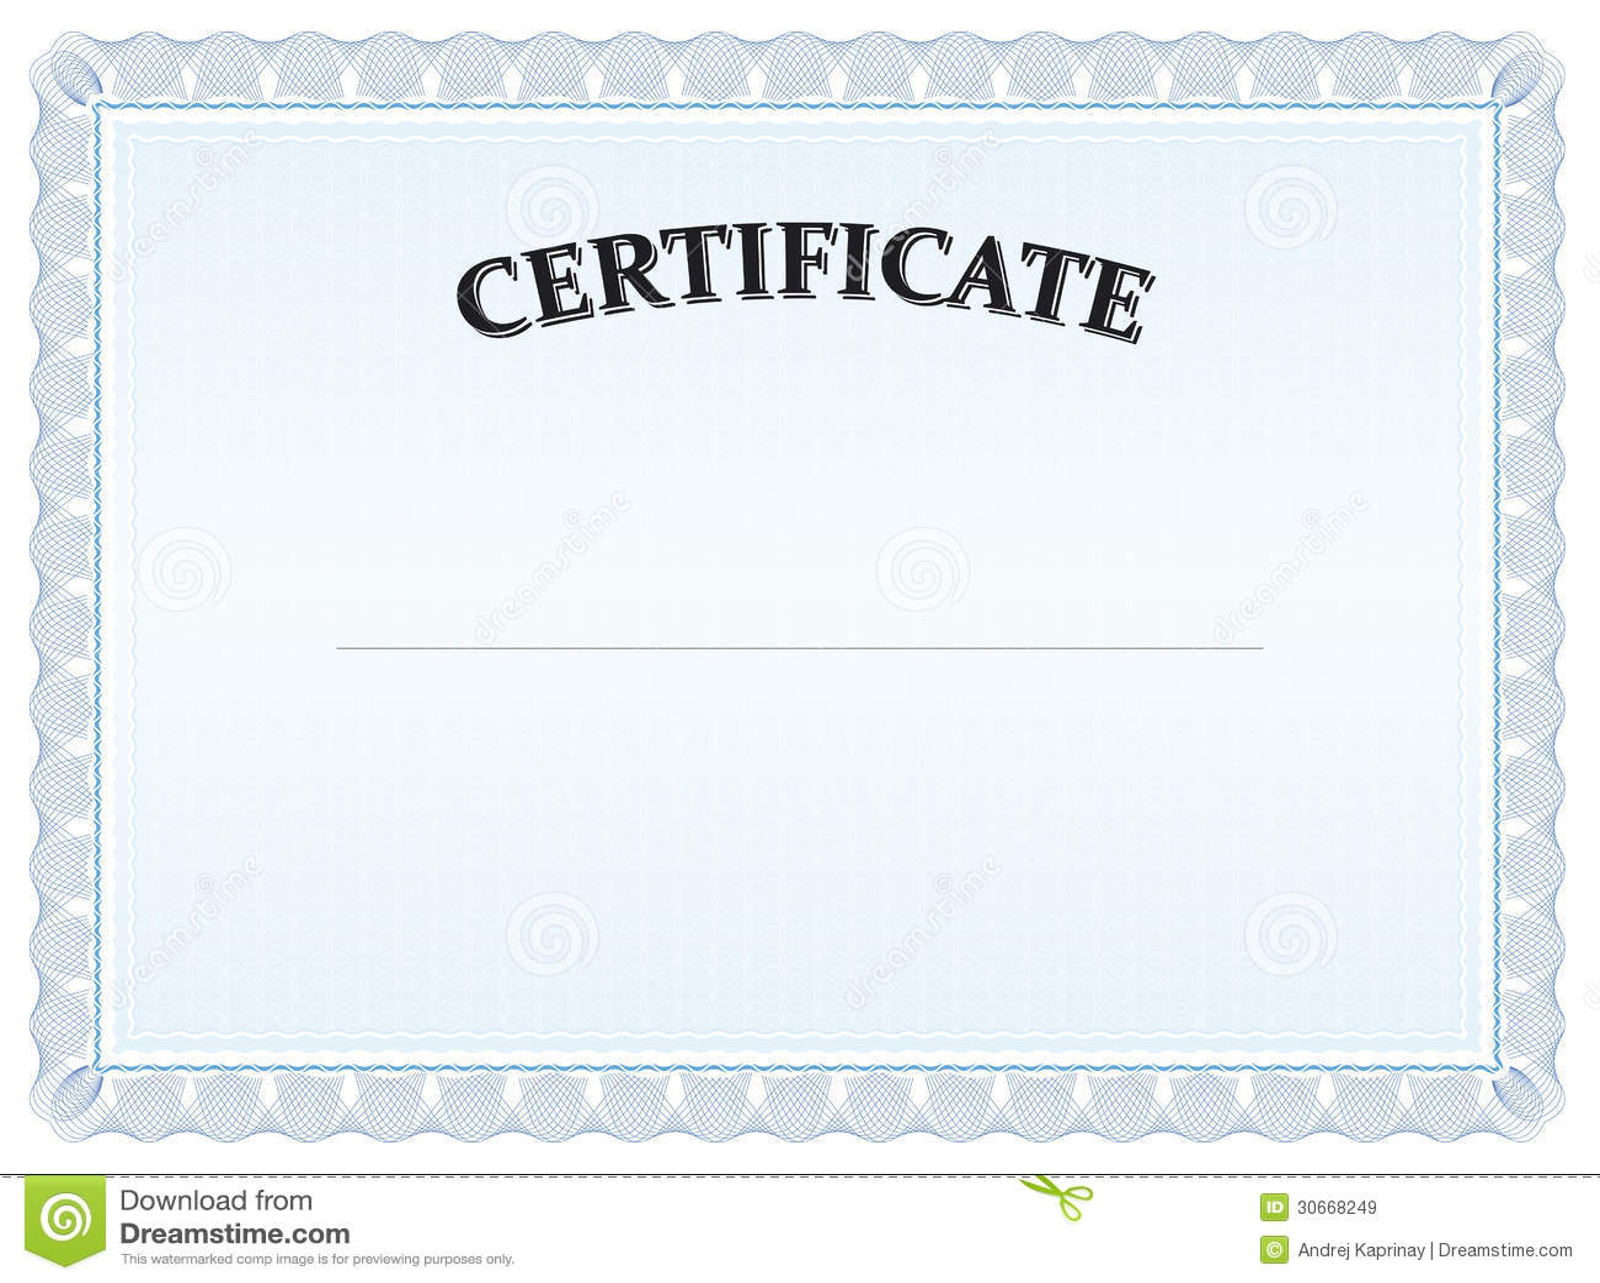 Blue Certificate Graduate Diploma Stock Vector - Image ...